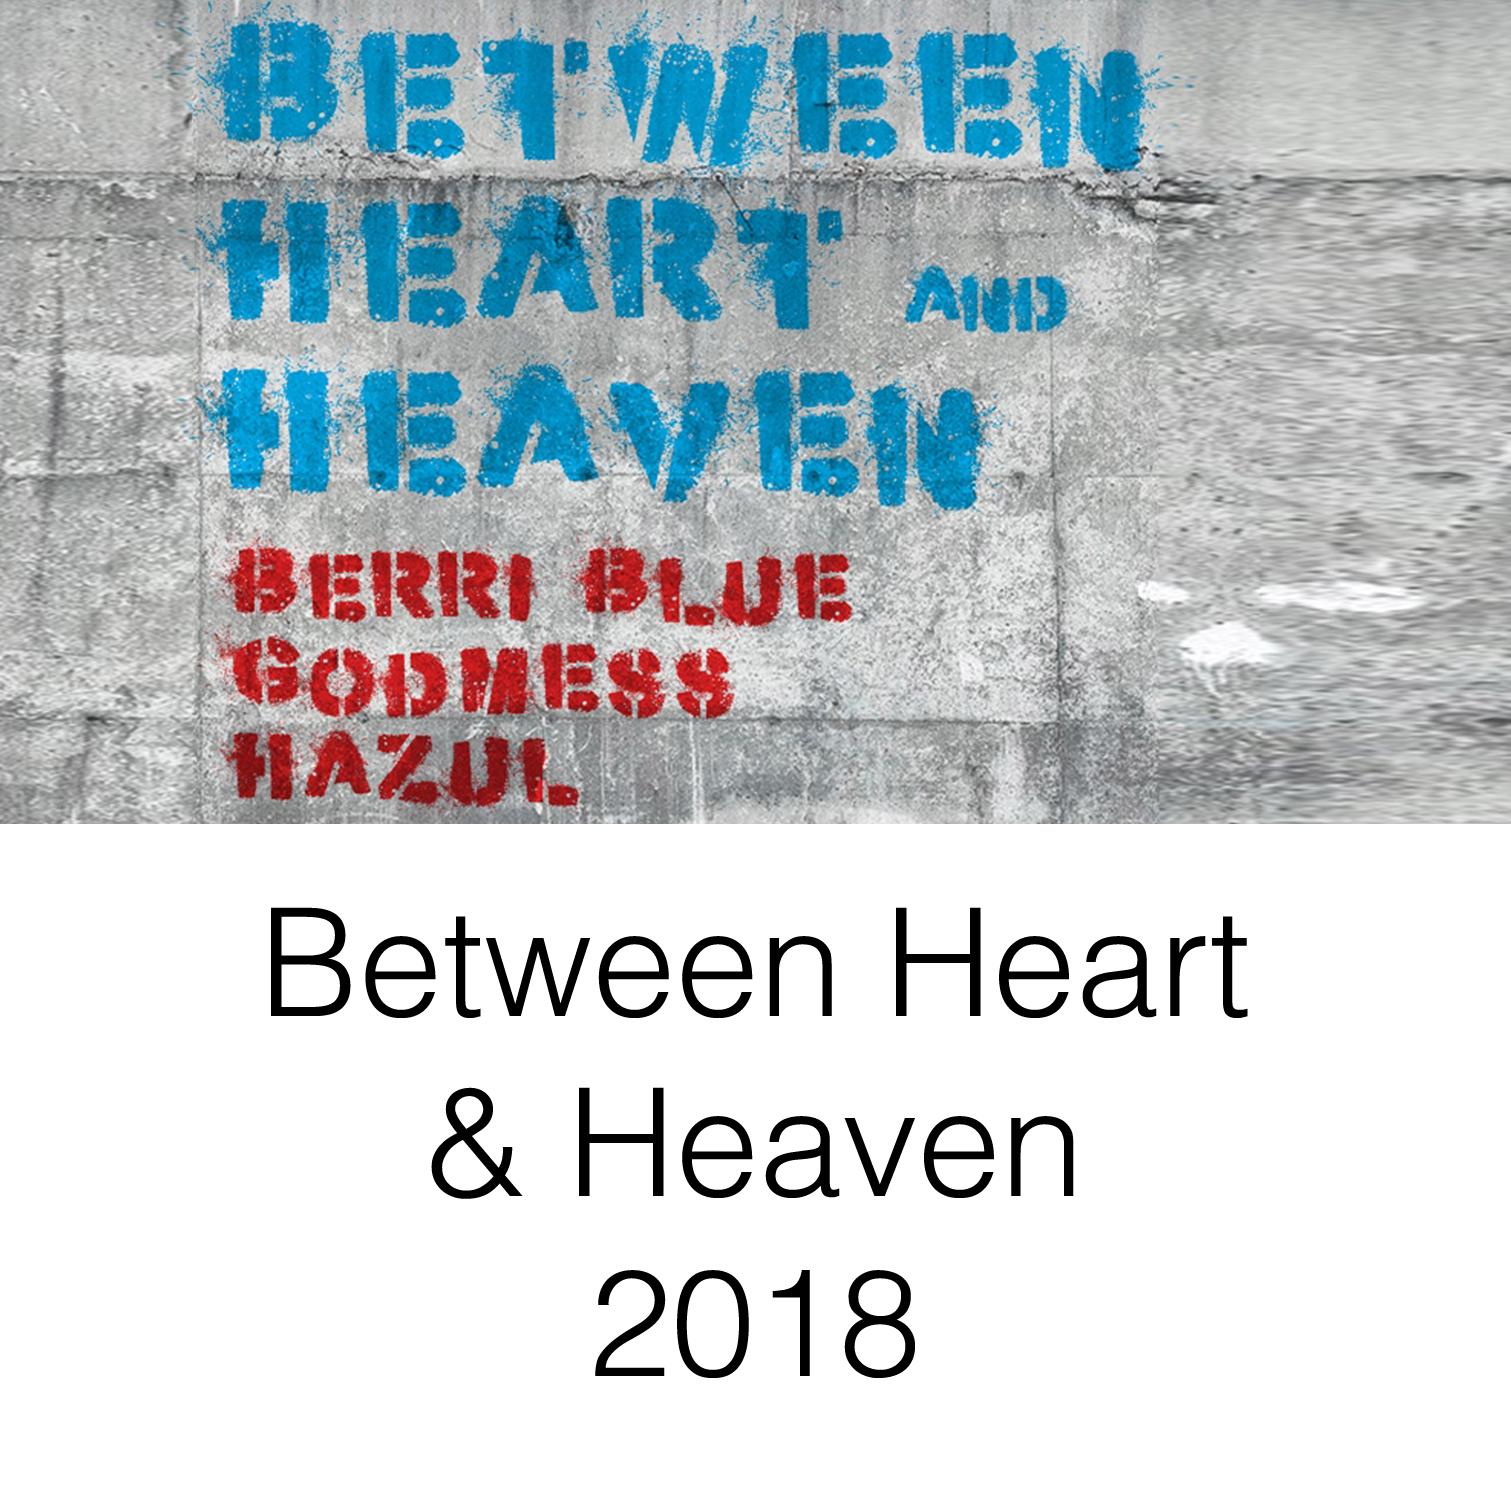 Between Heart Heaven Exhibition Berriblue Hazul Godmess Painting Wood DaVinci